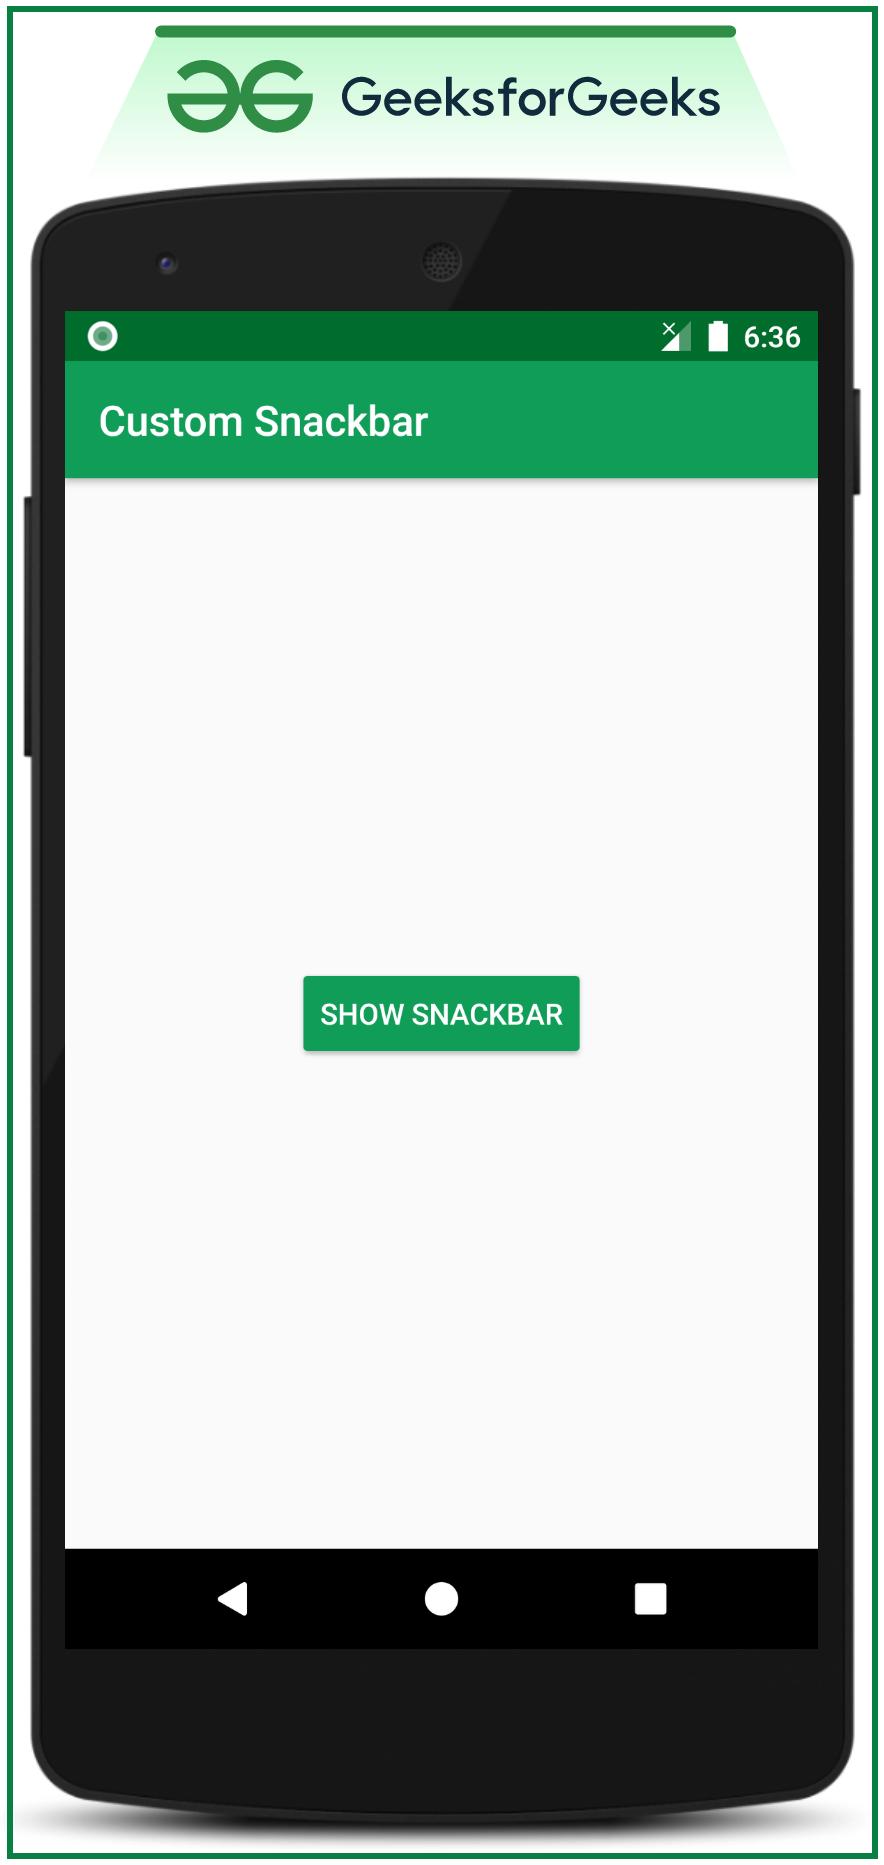 Custom Snackbars in Android